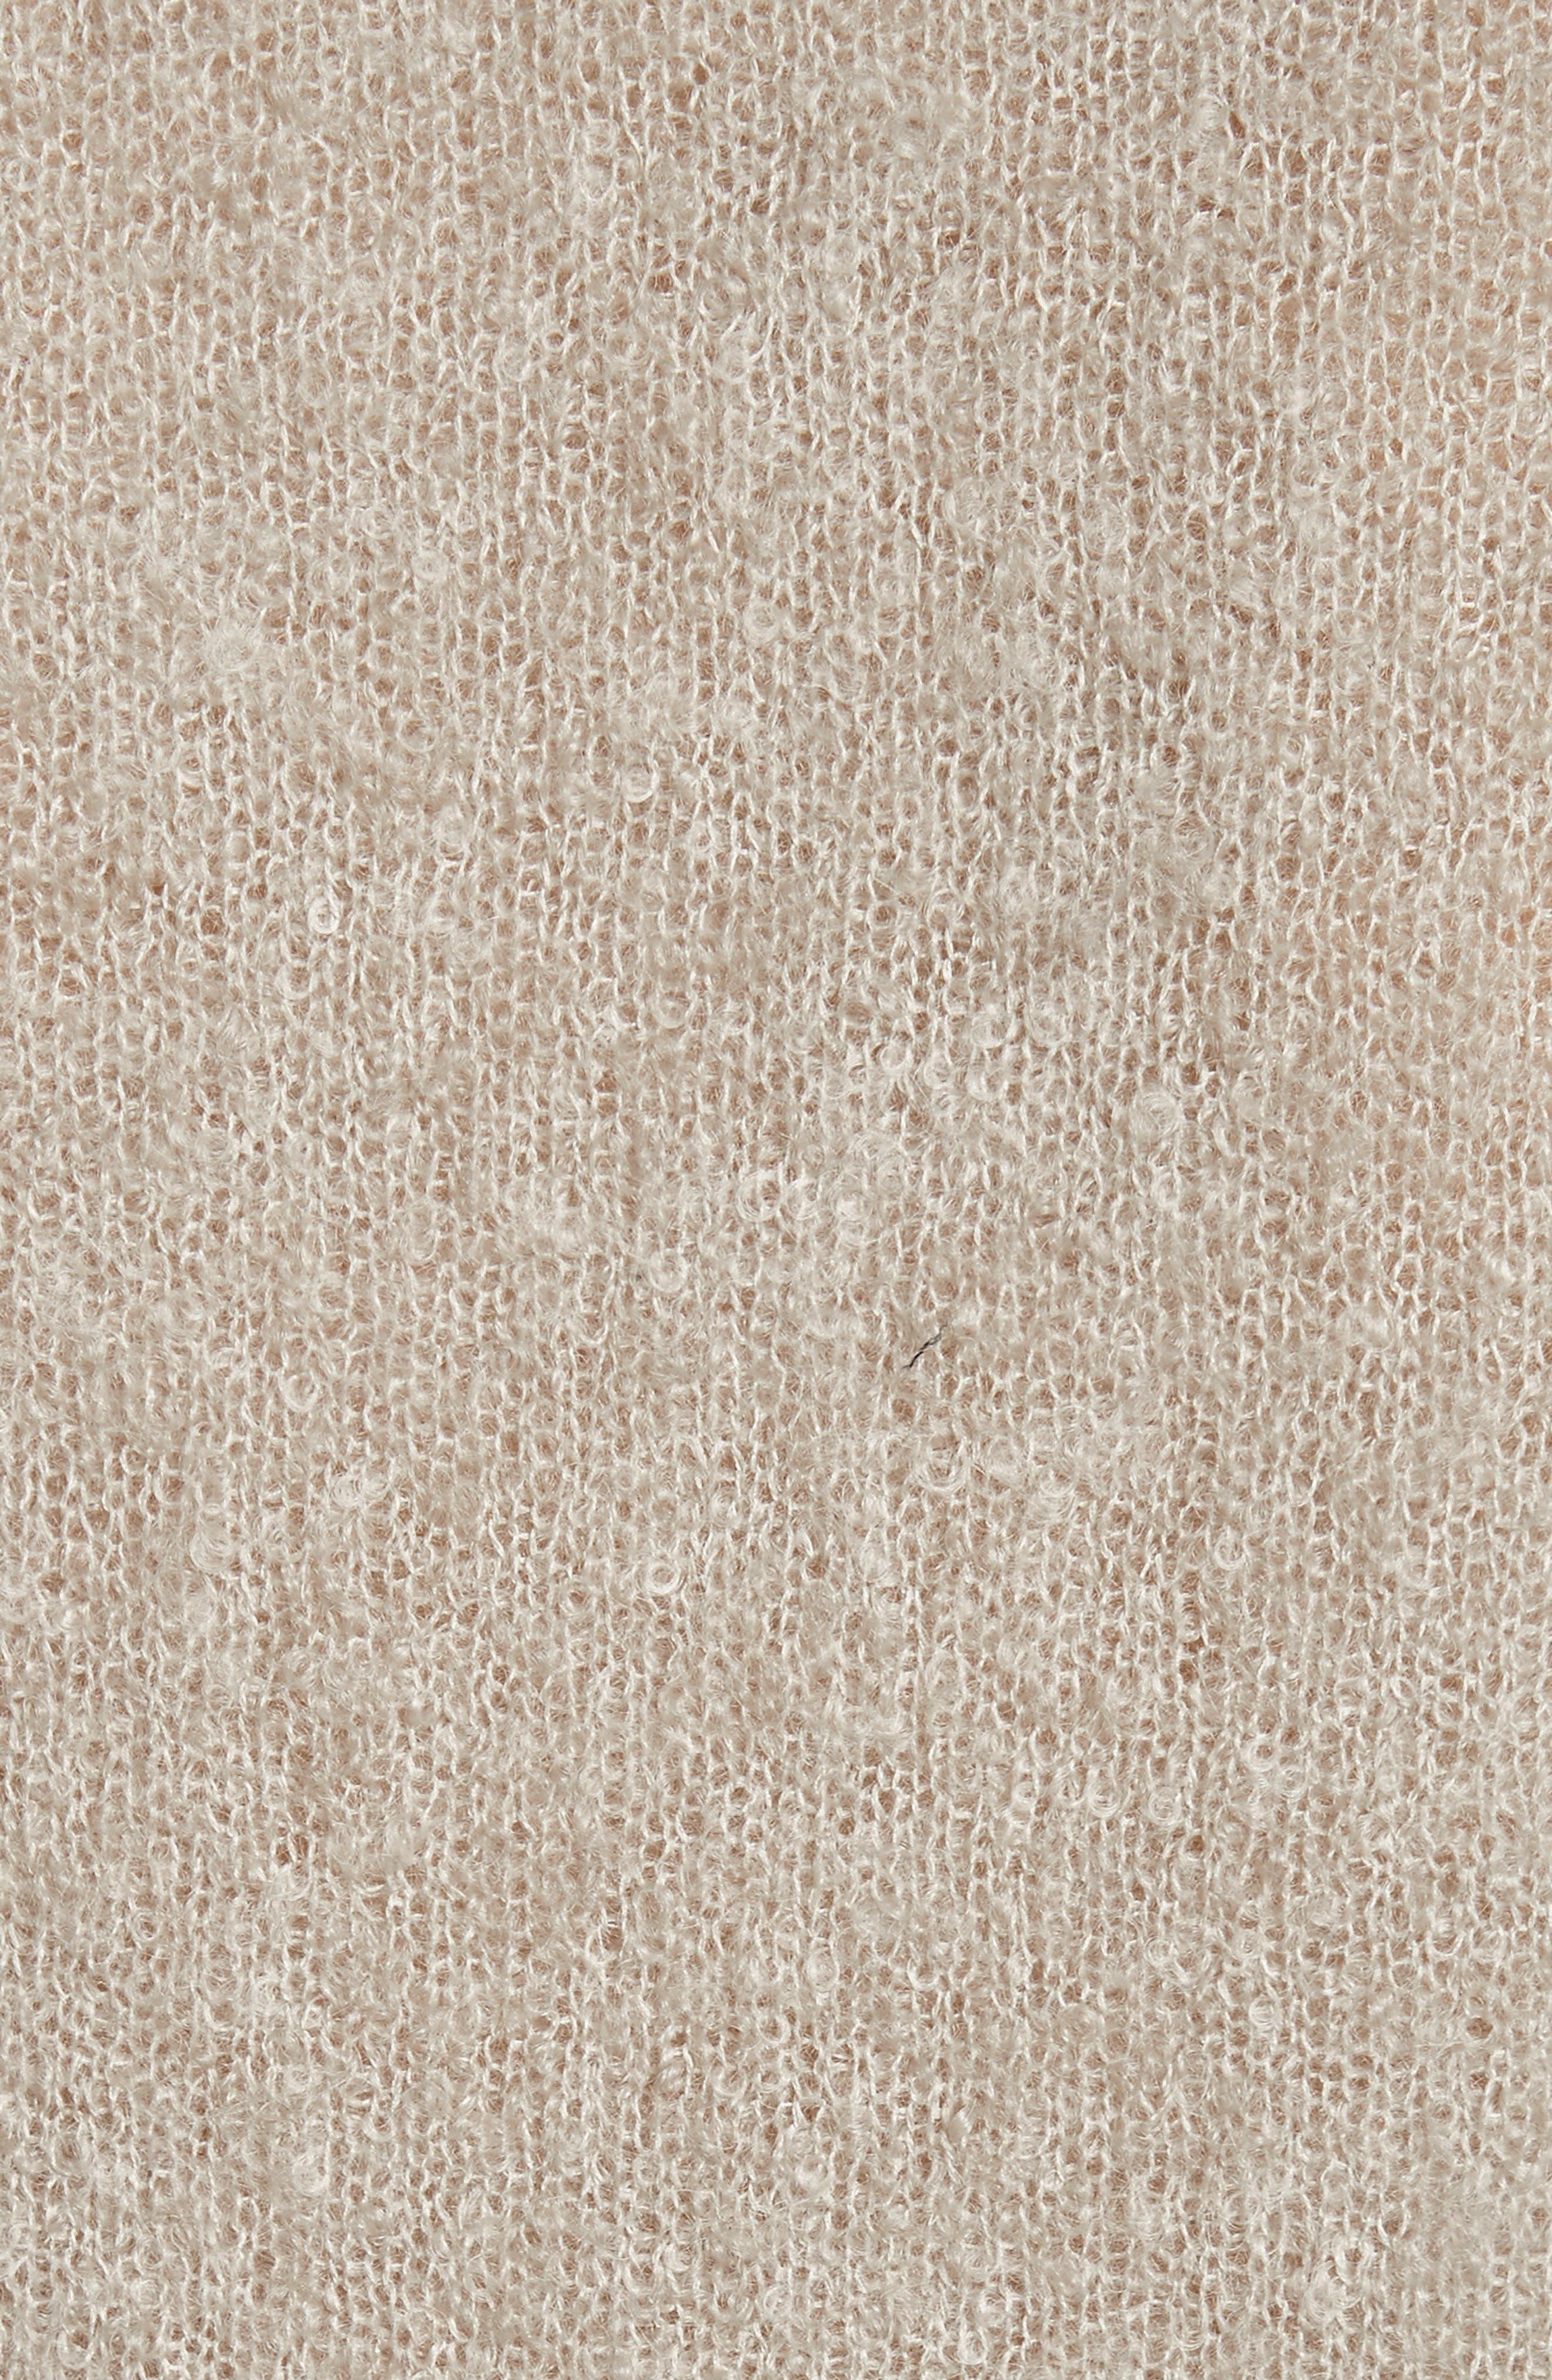 Tatum Mohair & Silk Sweater,                             Alternate thumbnail 5, color,                             020